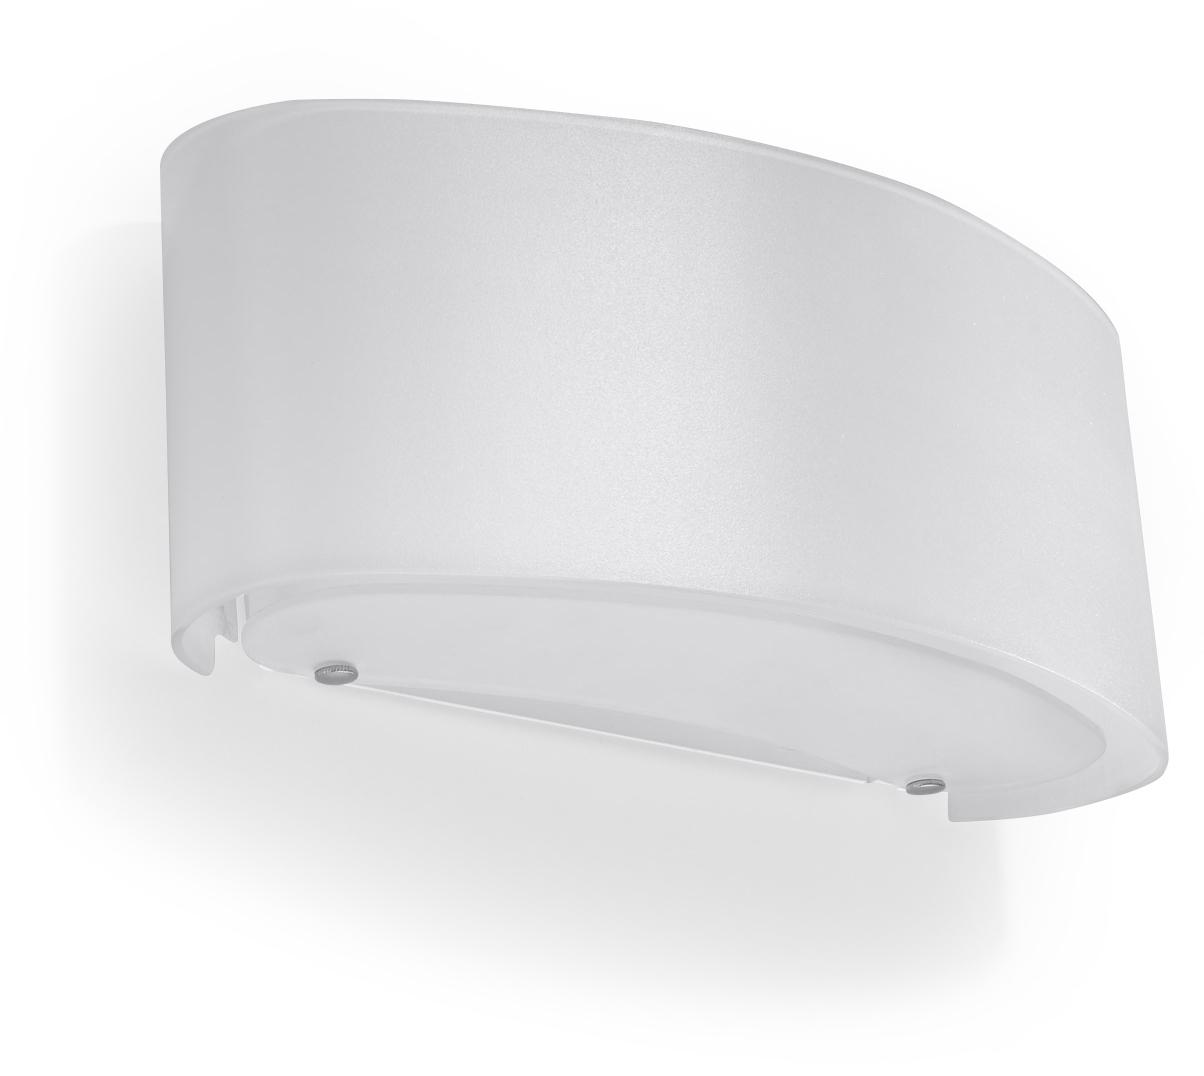 Biały Kinkiet BORIS 30 SL.0183